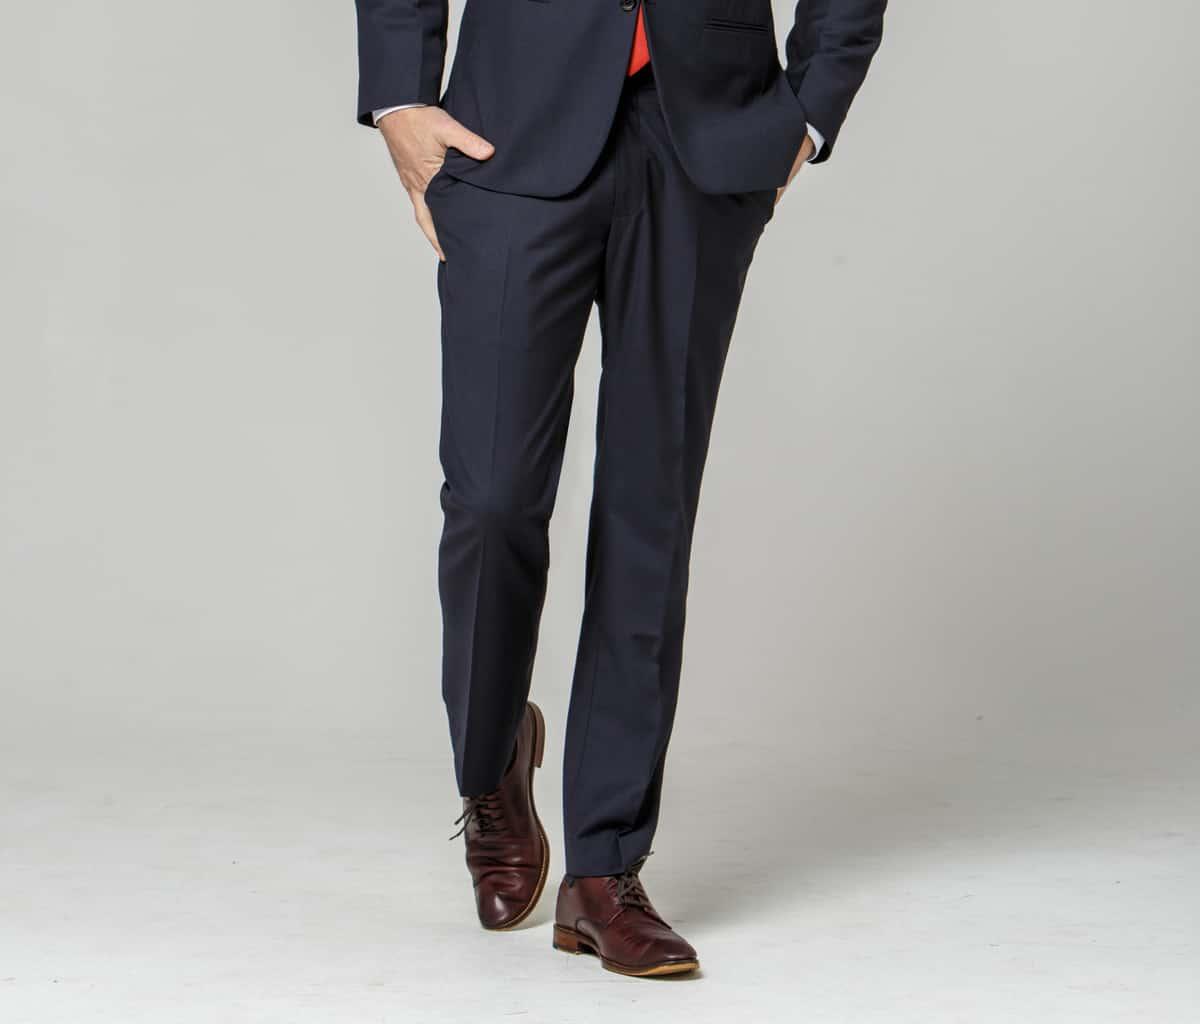 Dark Navy Trousers – Ready to Wear